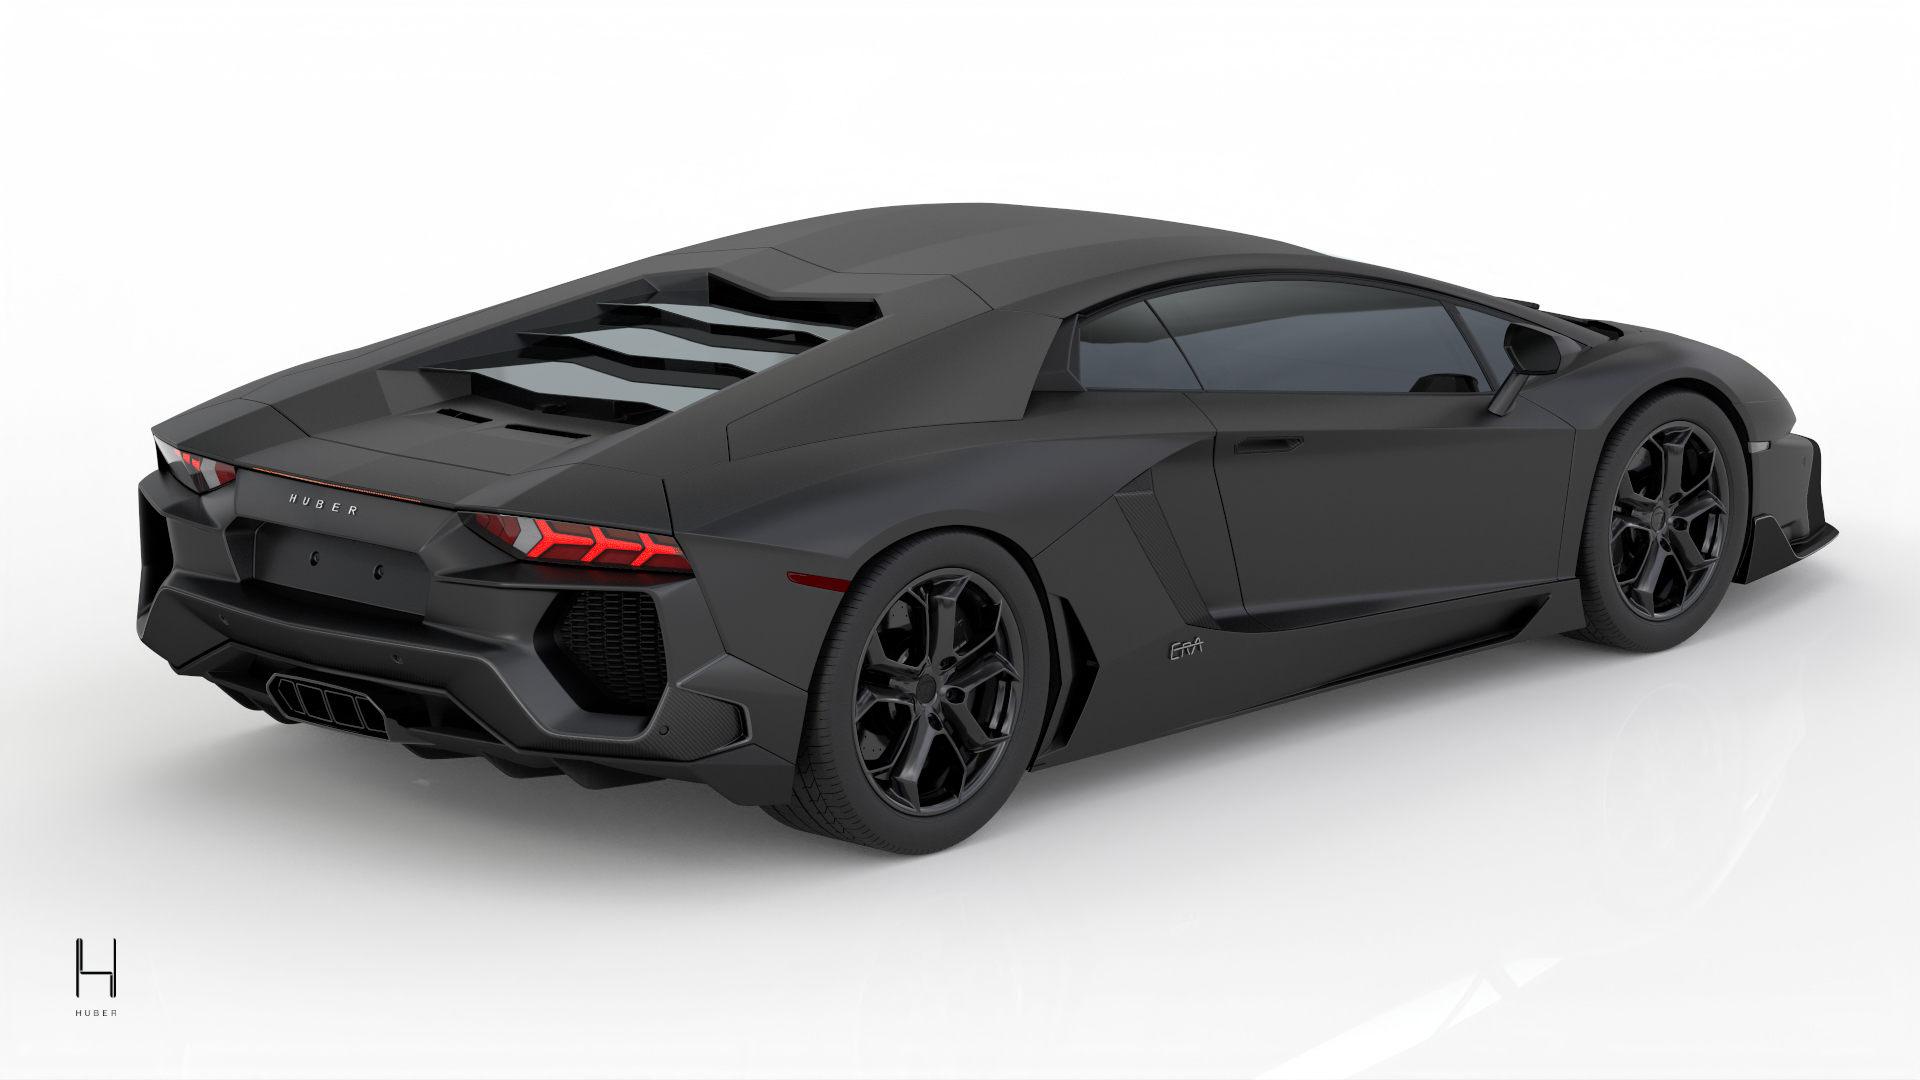 Lamborghini-Aventador-by-Huber-2